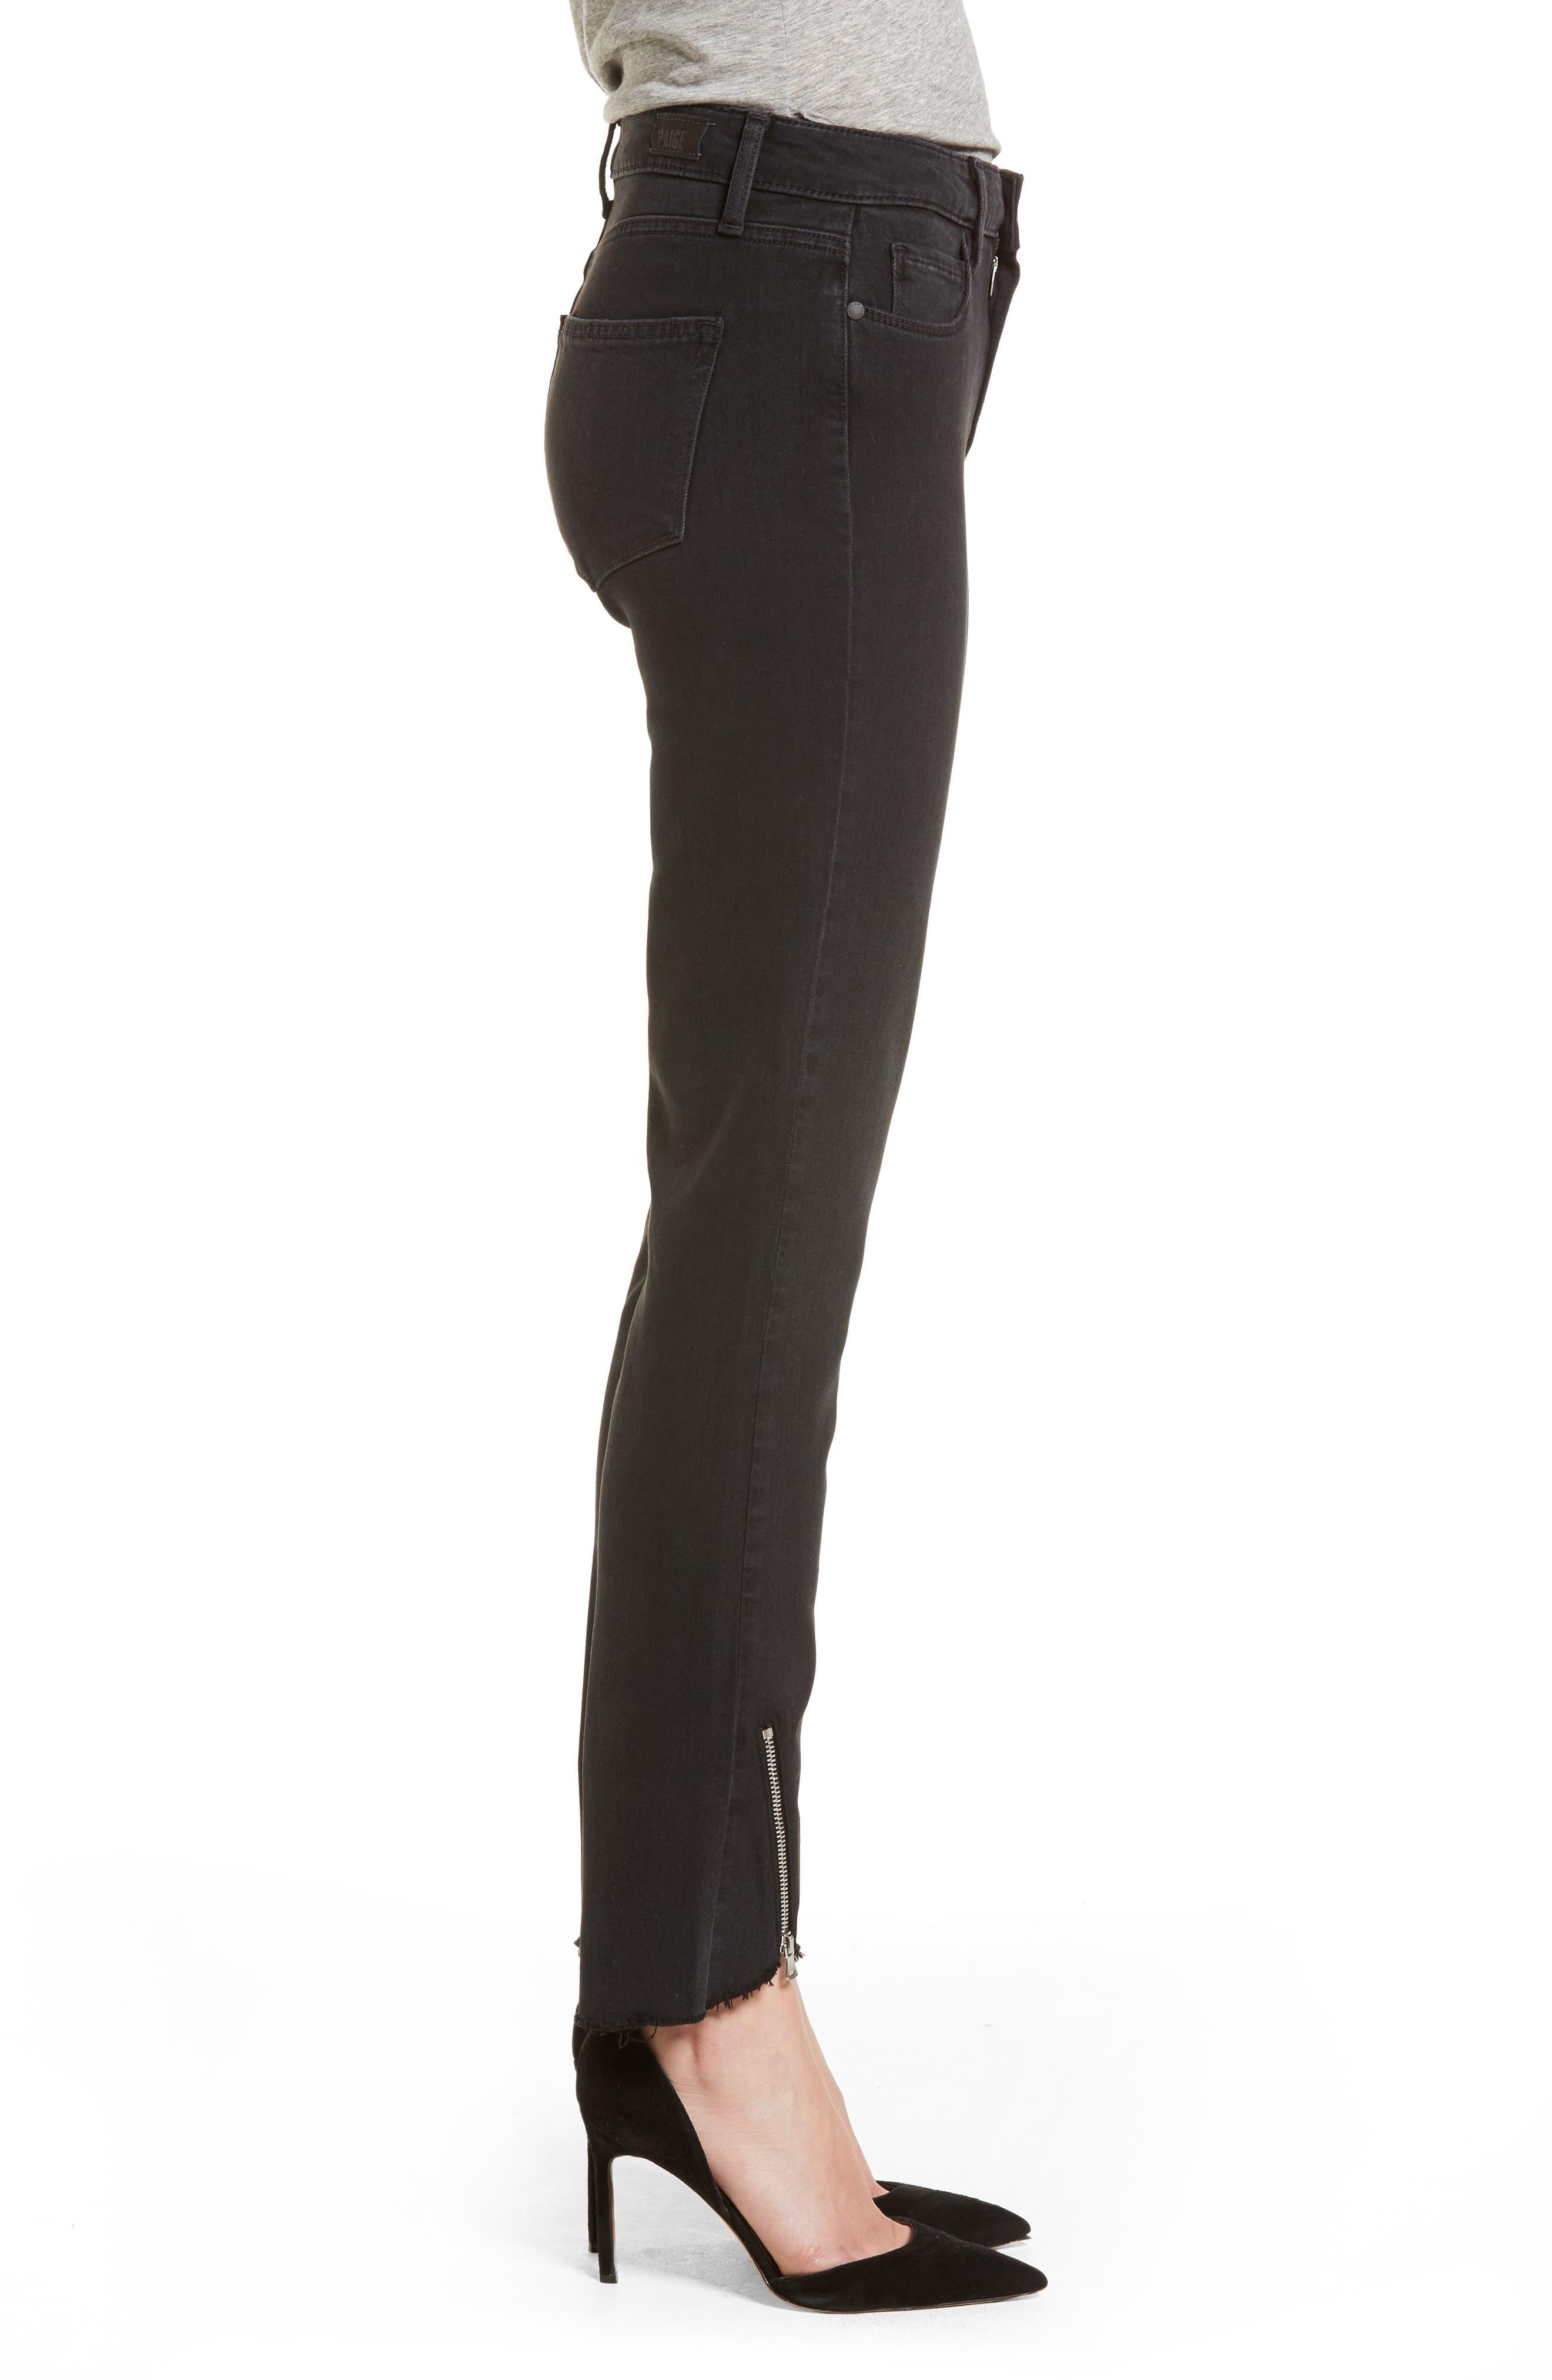 Transcend - Hoxton High Waist Ultra Skinny Jeans,                             Alternate thumbnail 3, color,                             Black Fog